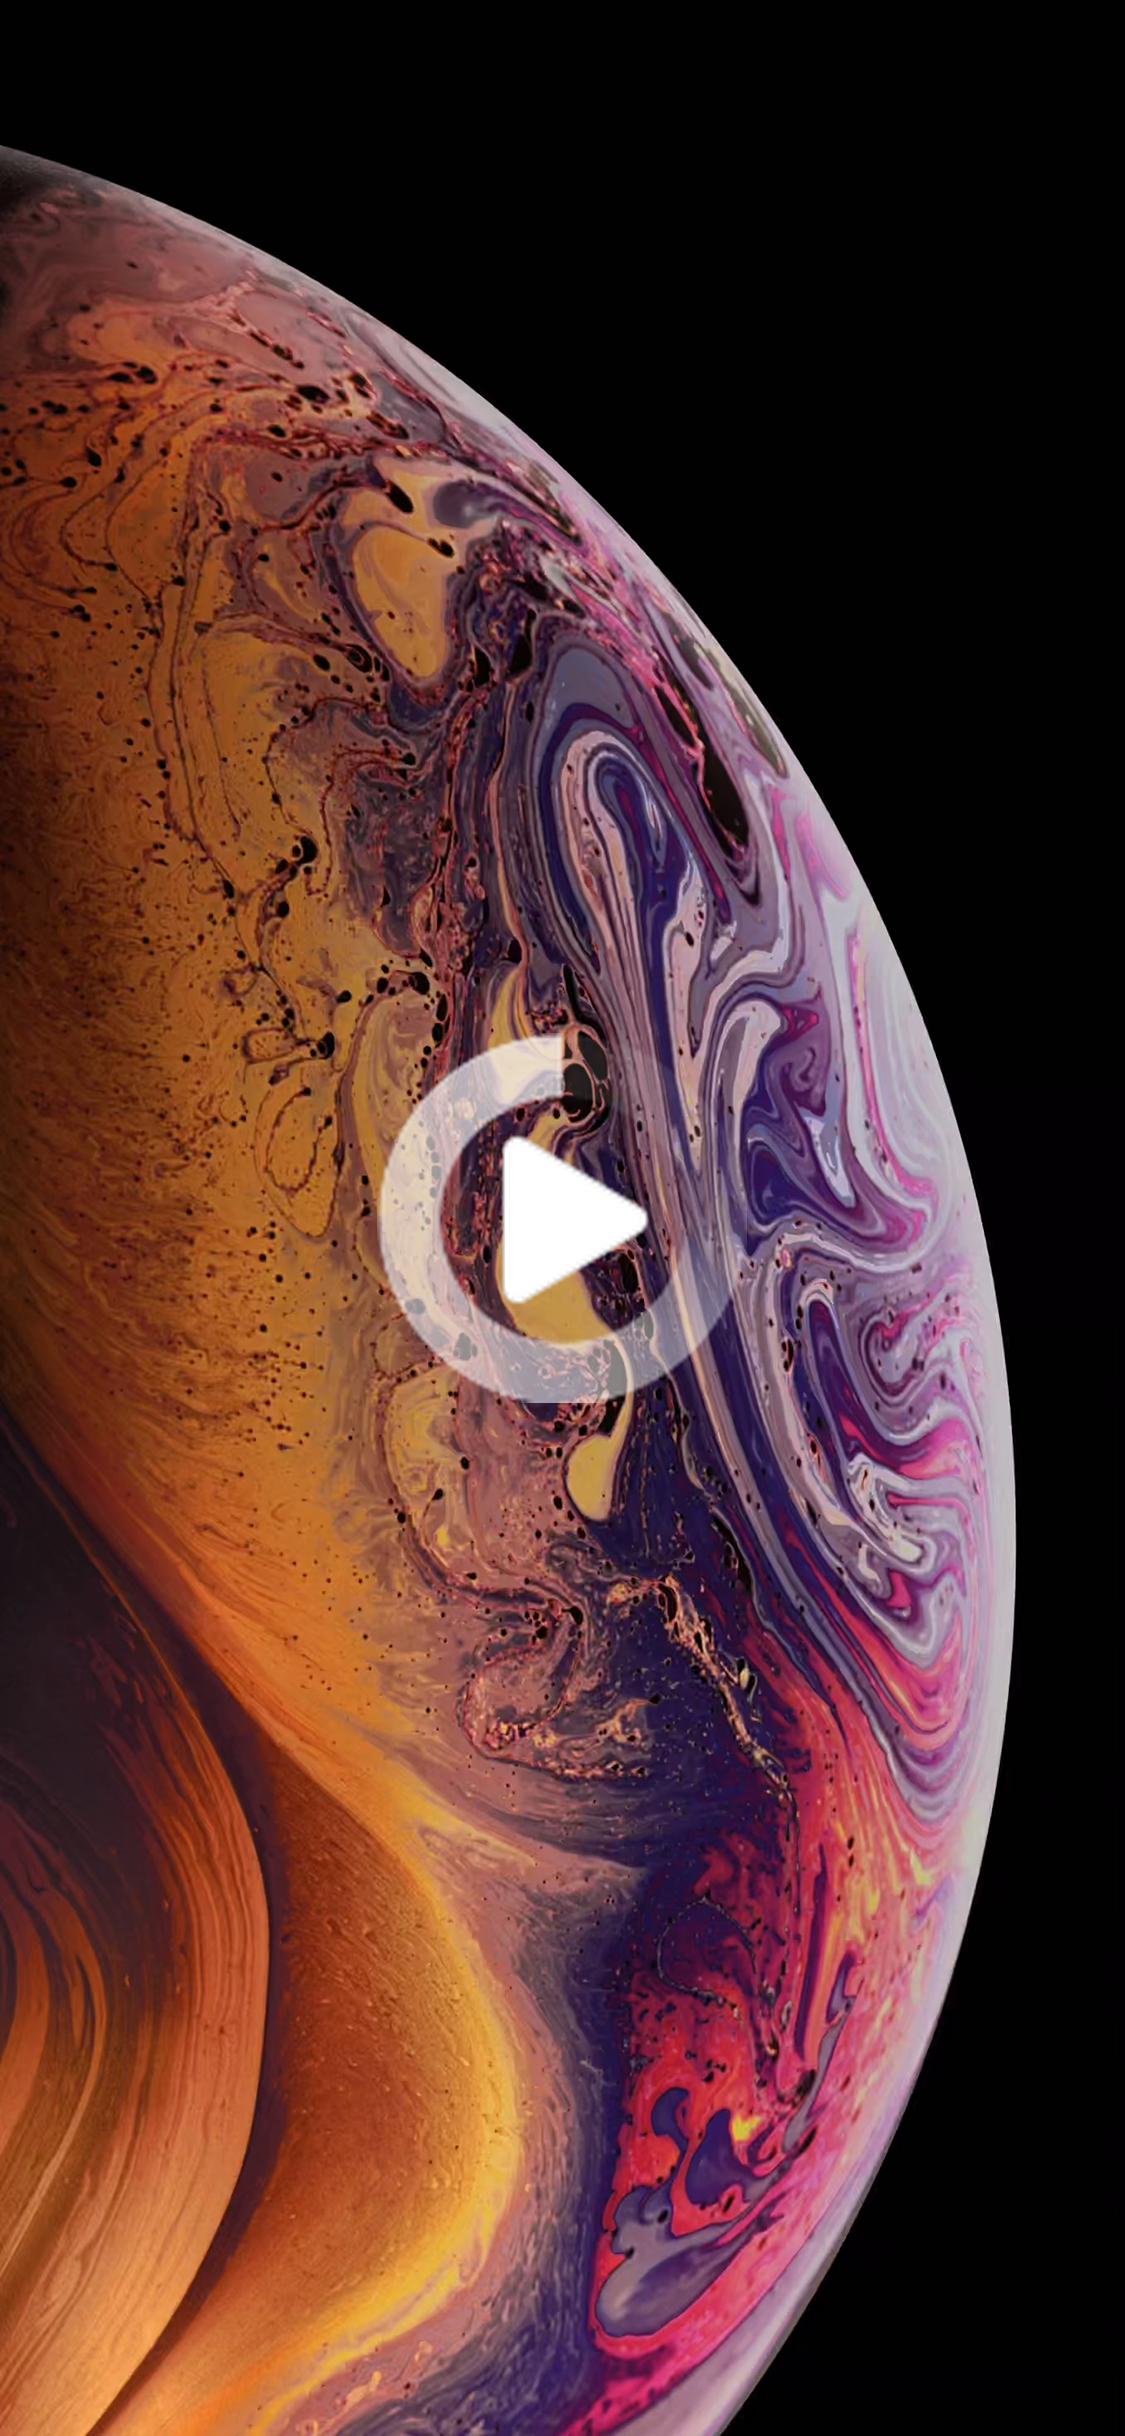 Iphonex Ios11 Ios12 Lockscreen Homescreen Backgrounds Apple Iphone Ipad Ios Wallpaper Live Wallpapers Live Wallpaper Iphone Iphone